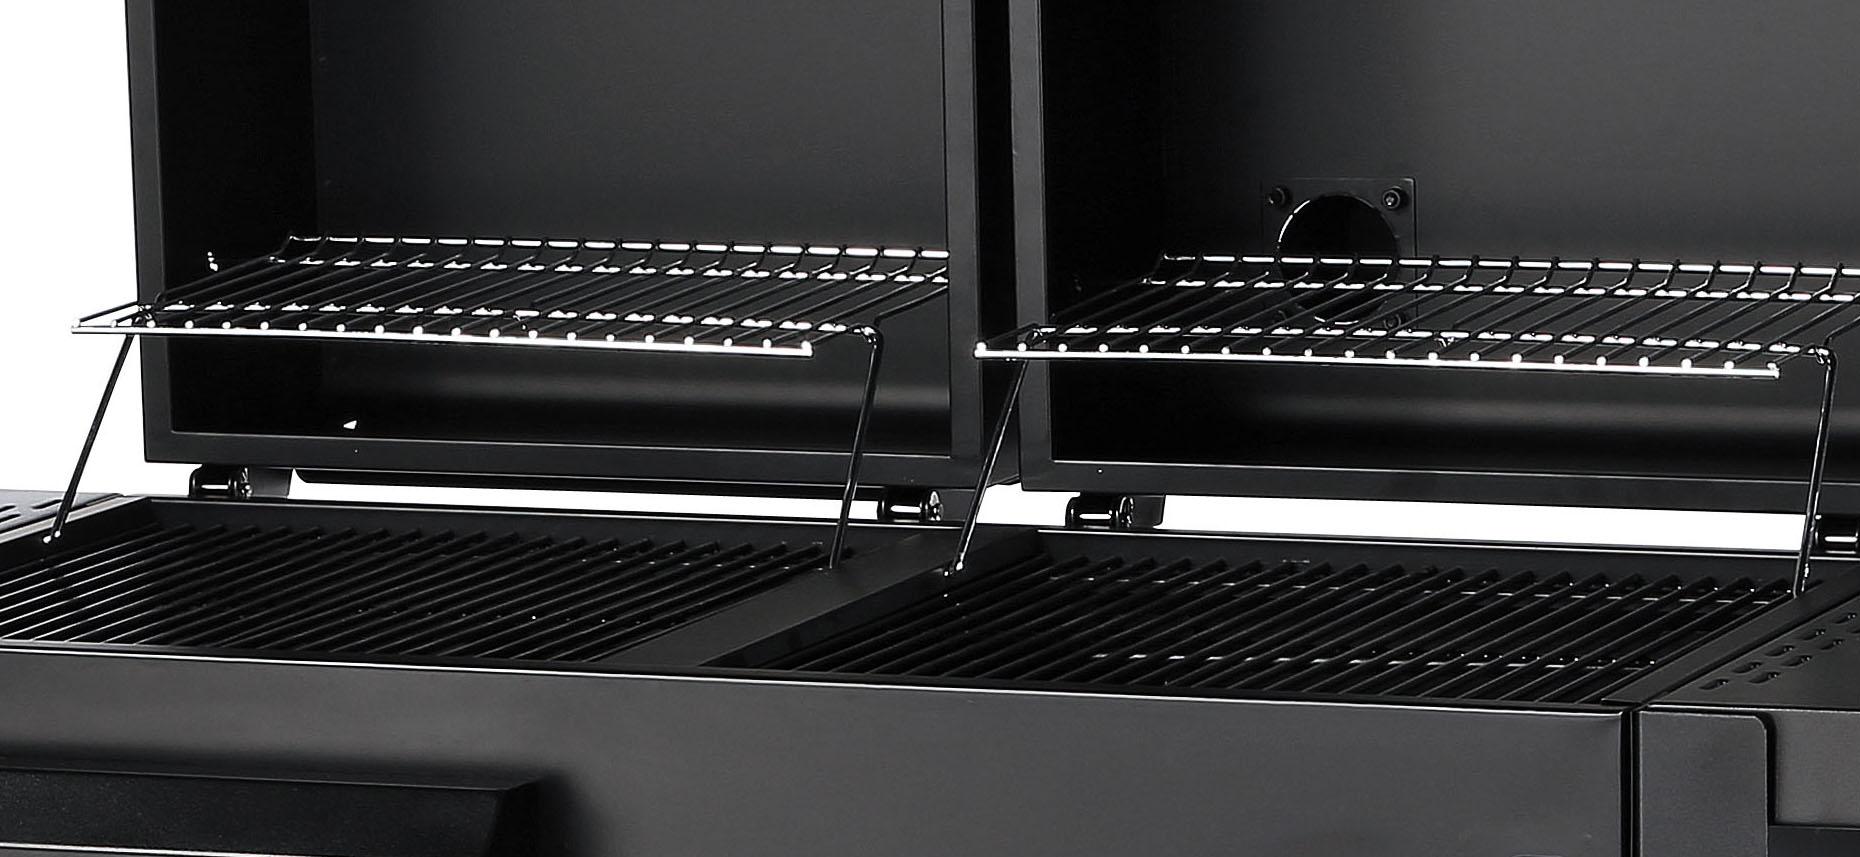 set aktion twin grill t36 kombigrill mit gas und holzkohle von chef centre ebay. Black Bedroom Furniture Sets. Home Design Ideas